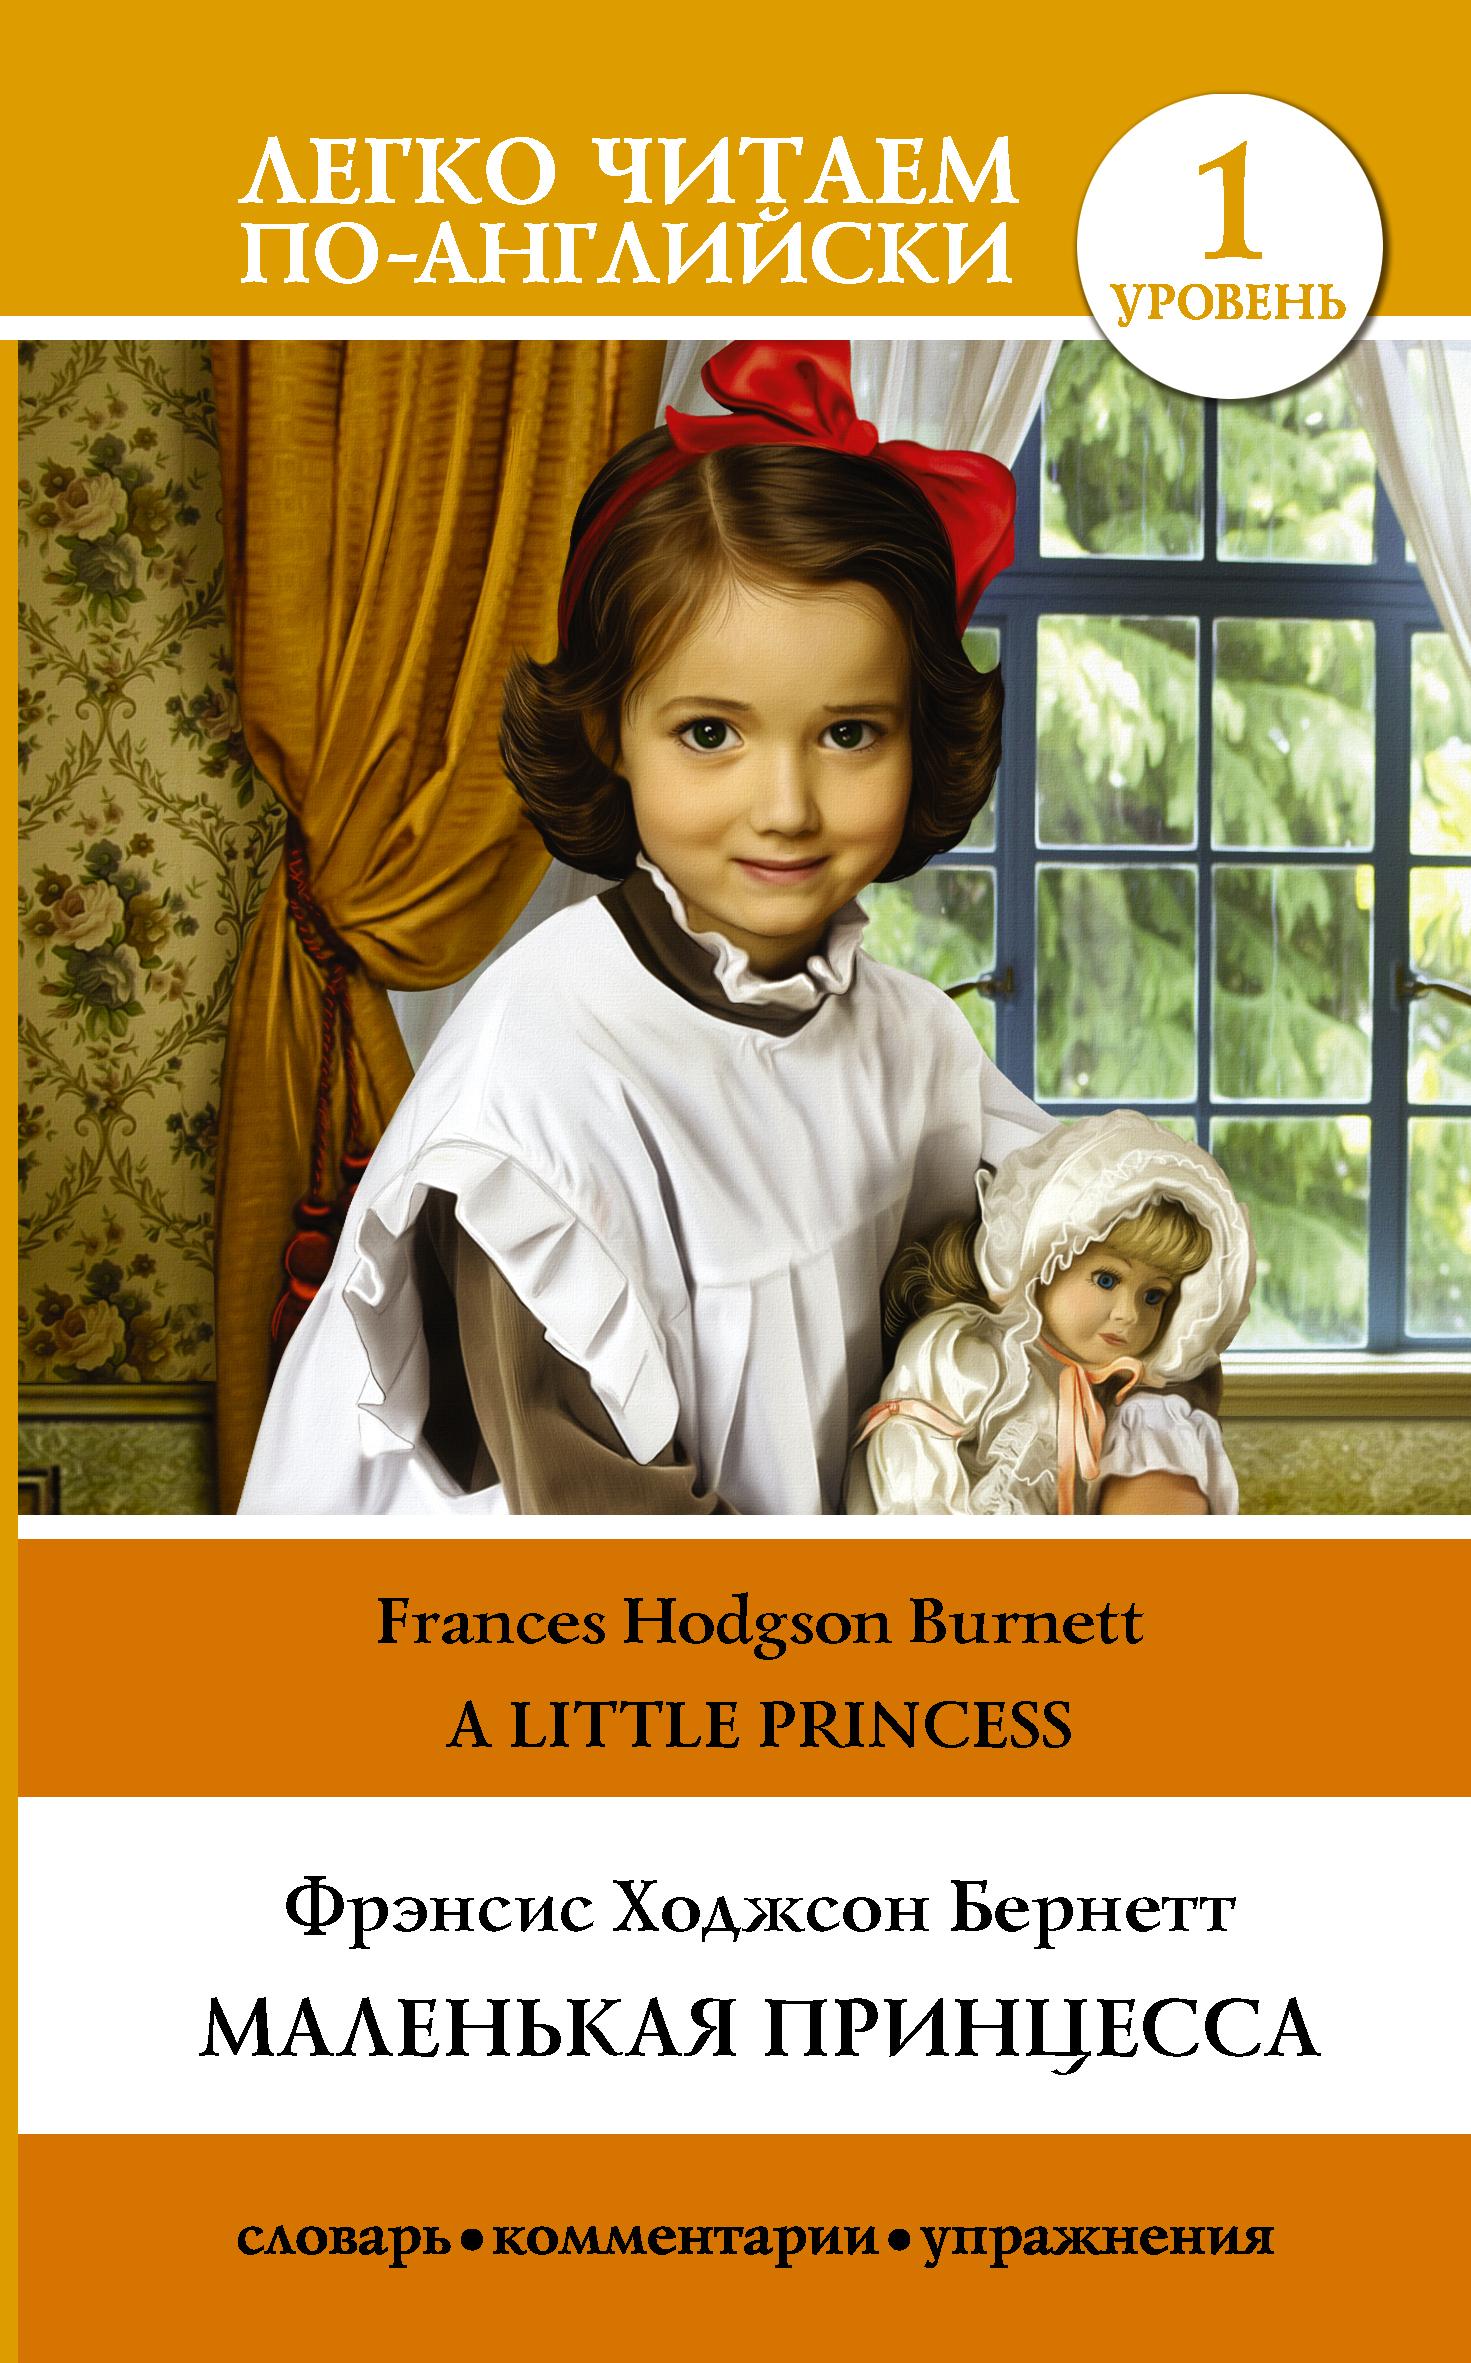 Ф. Х. Бернетт Маленькая принцесса